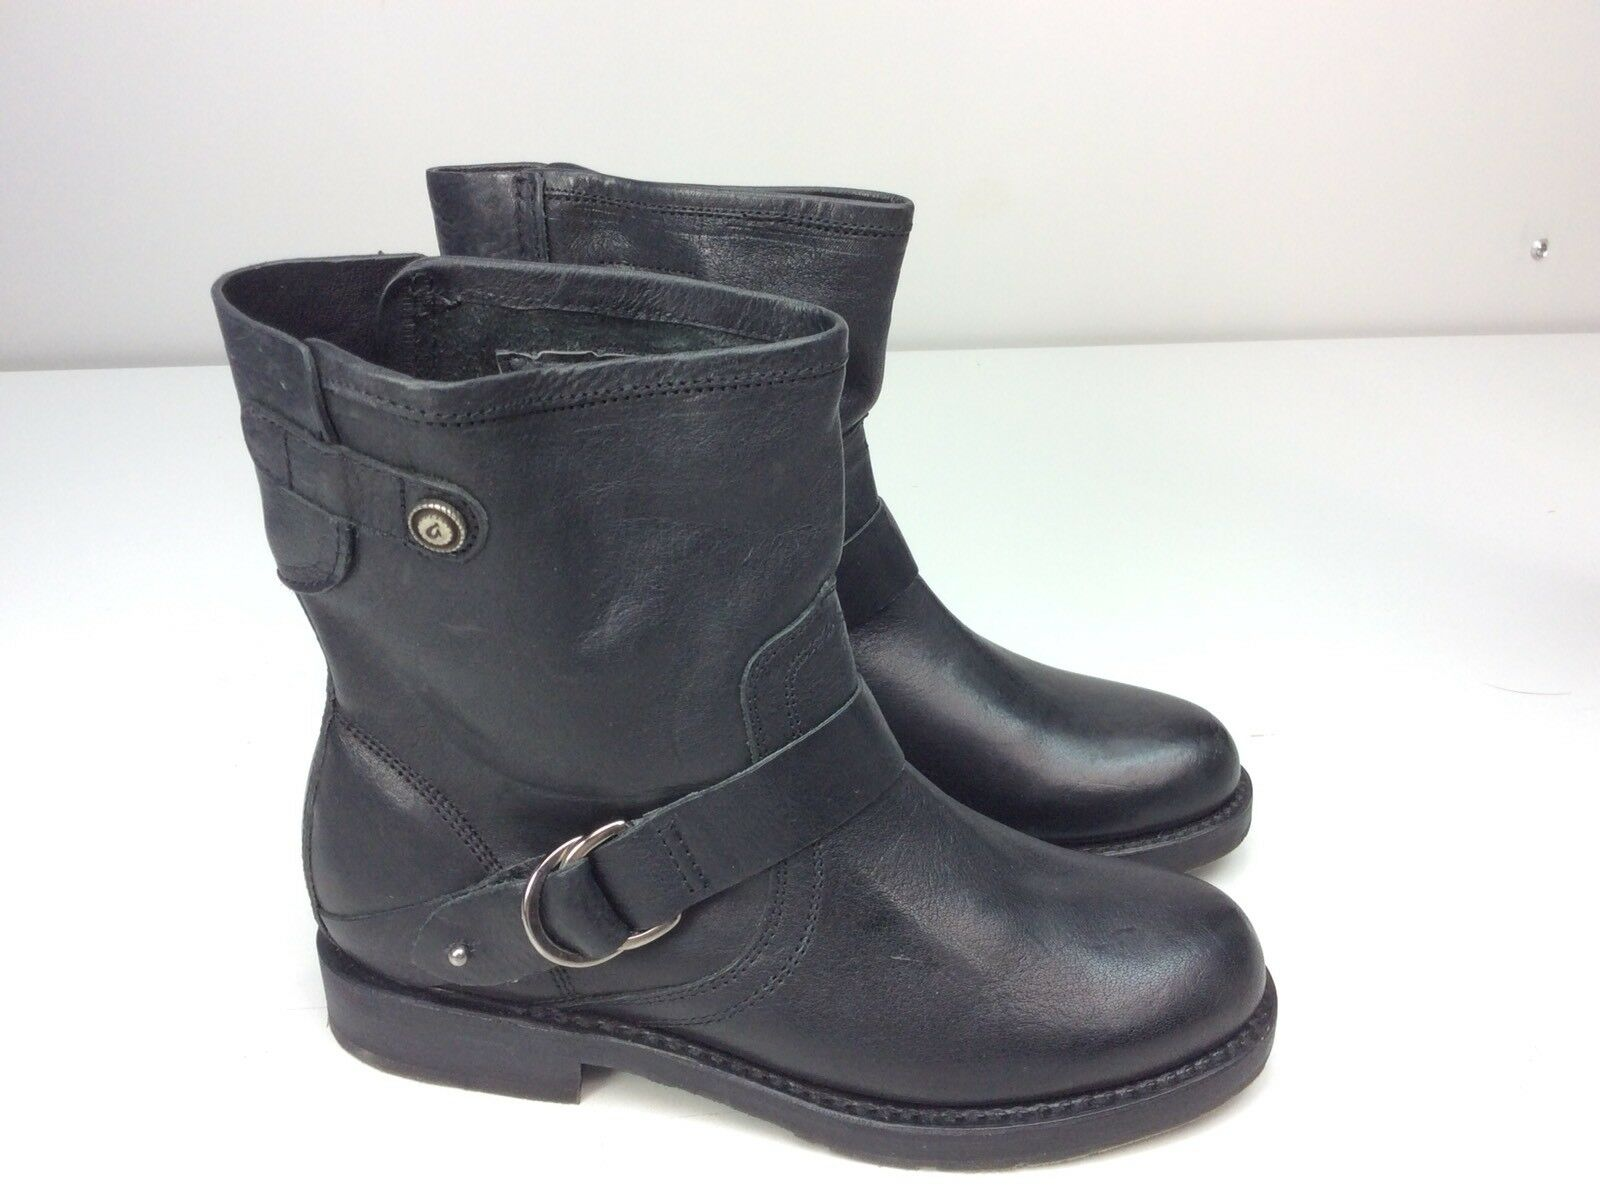 Olukai nahuku Pantalones cortos para mujer 7 botas De Cuero Negro Moto Talla Corta 7 mujer B 531d8f